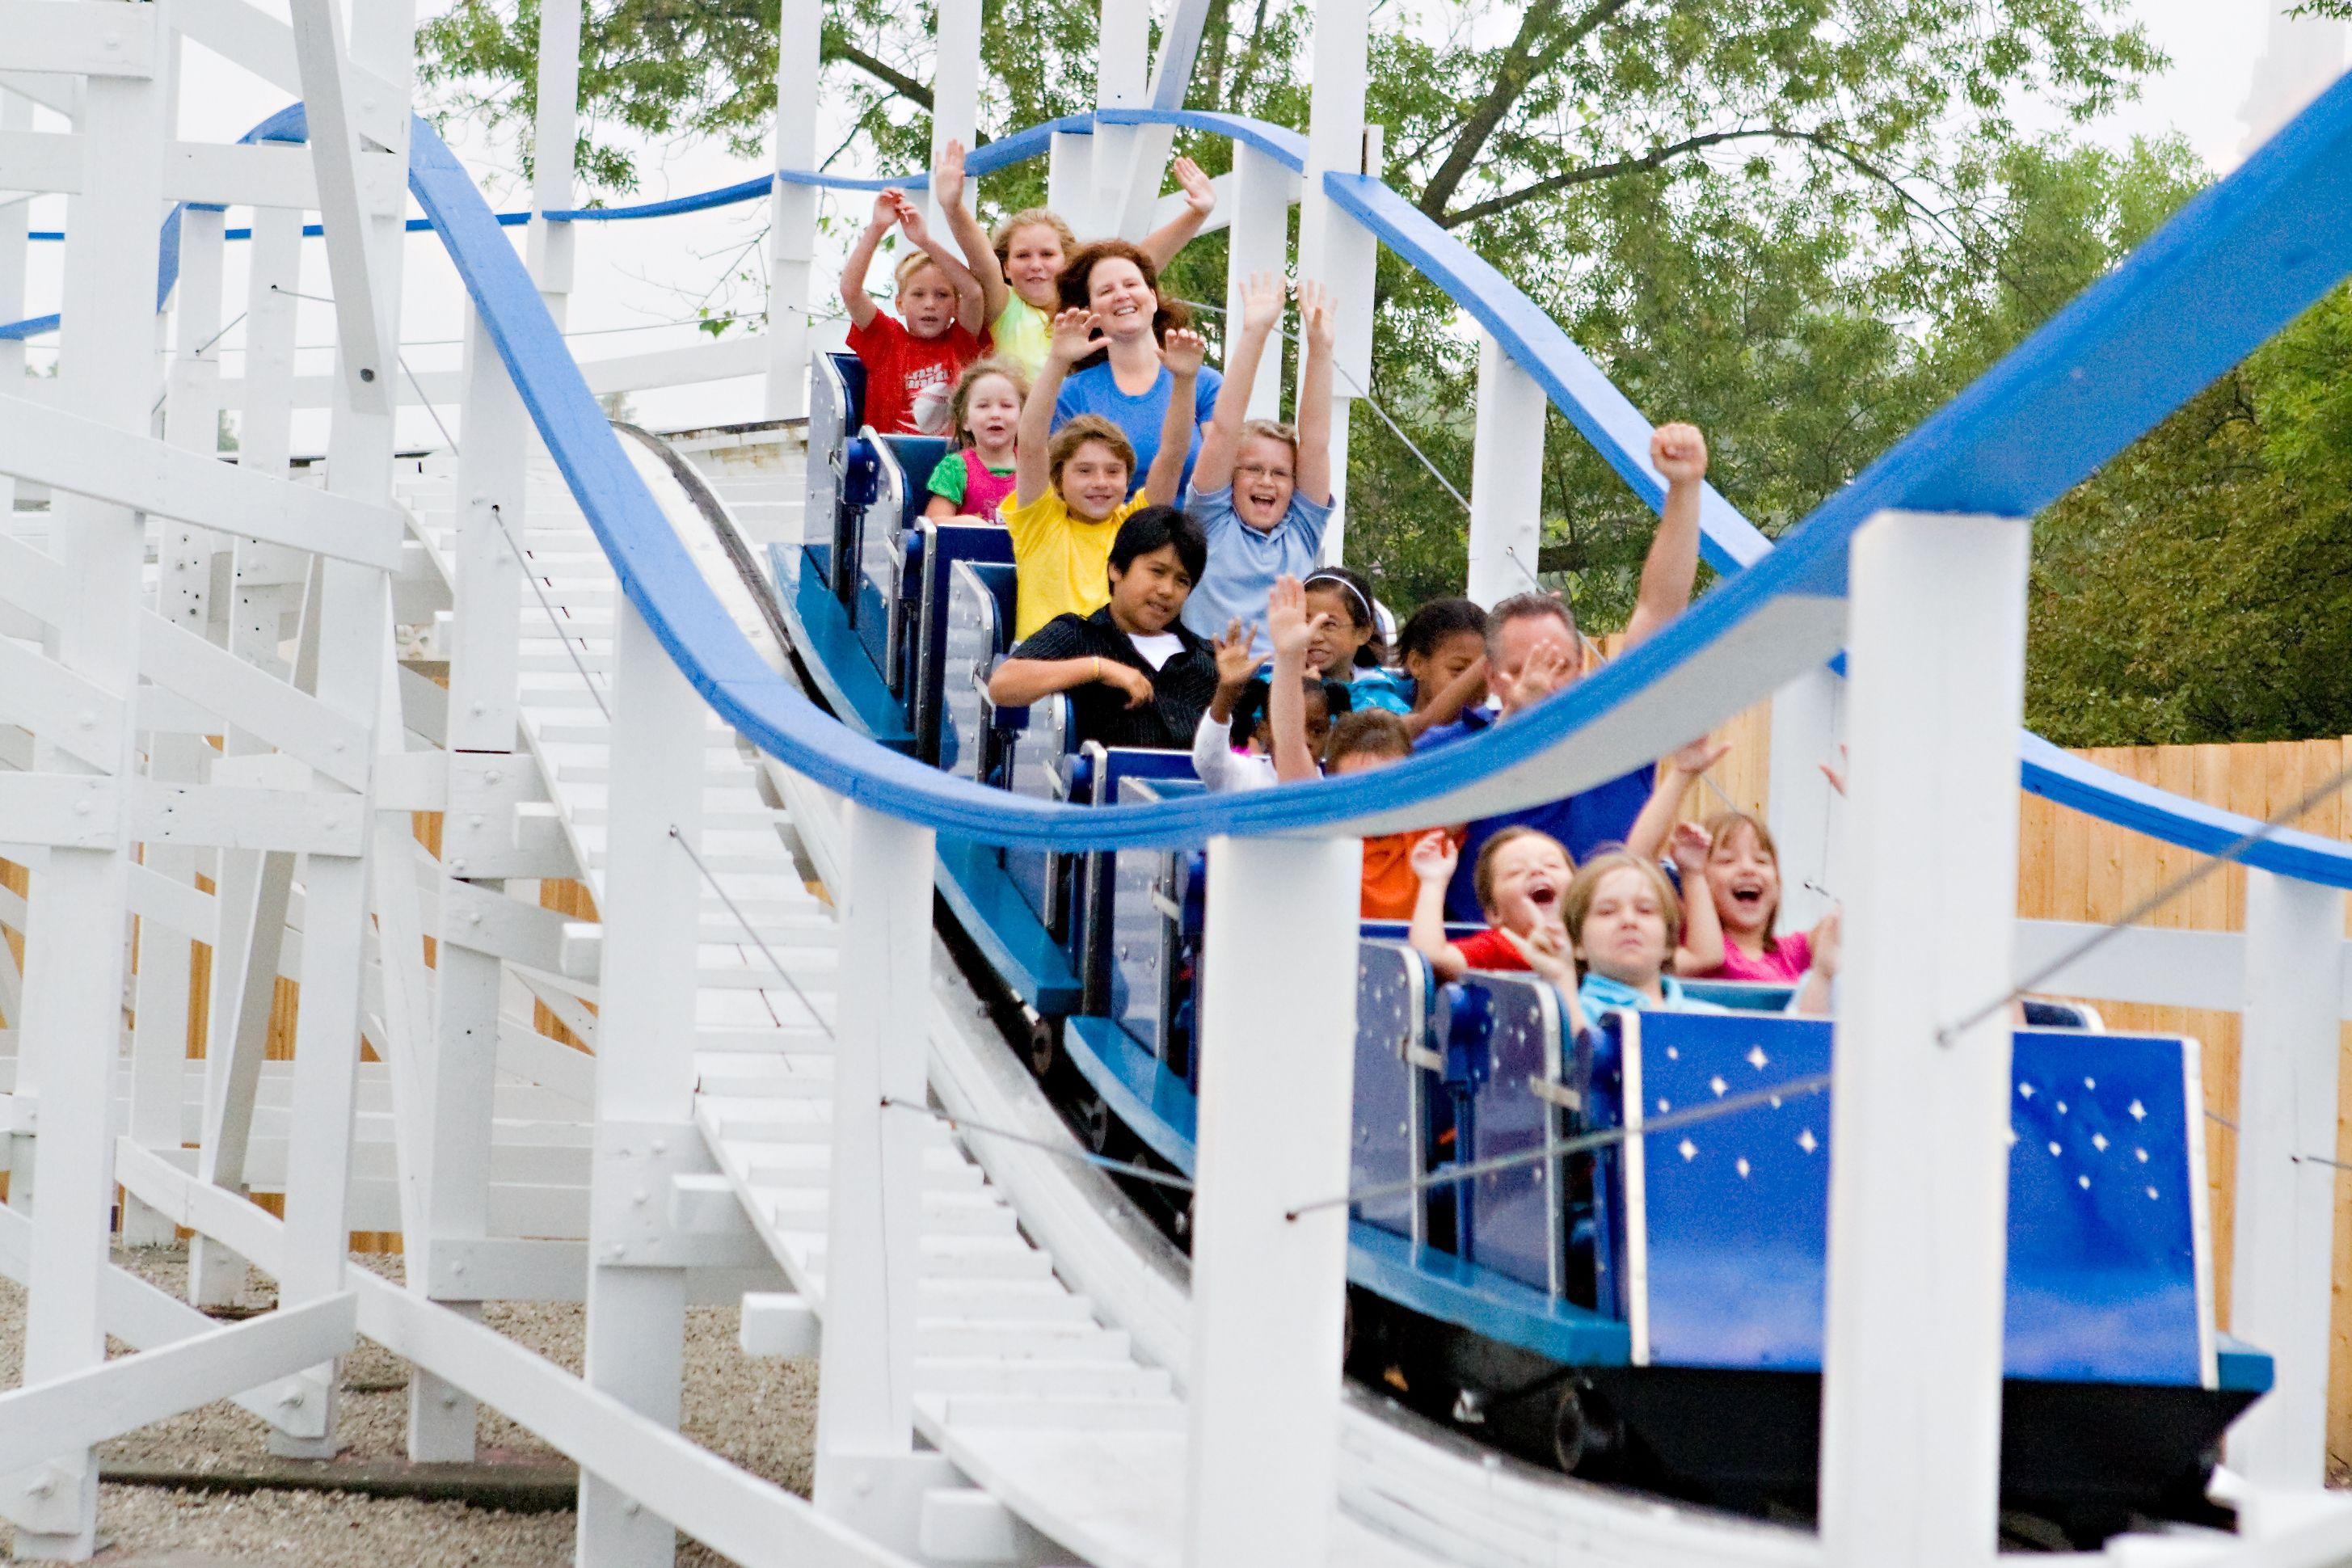 Little Dipper at Six Flags